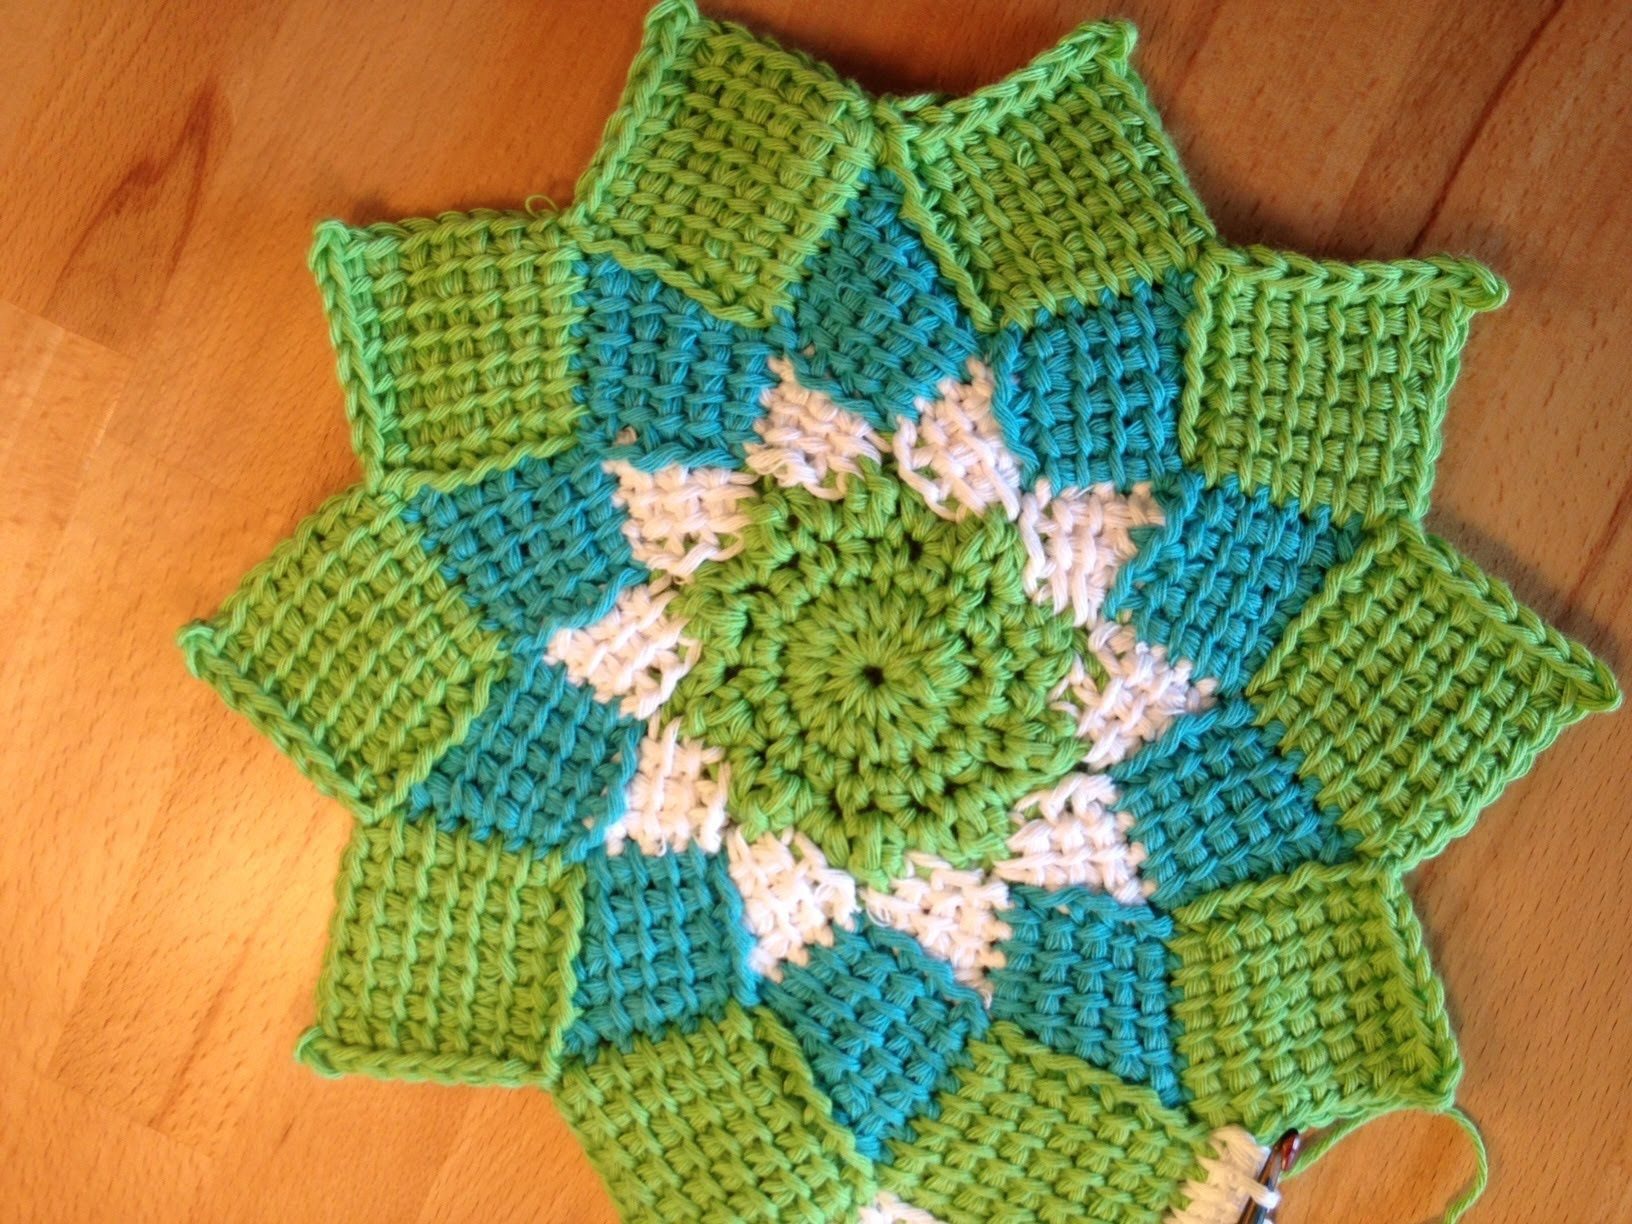 Tunesisch Häkeln - Entrelac Topflappen rund | Tunisian Crochet ...